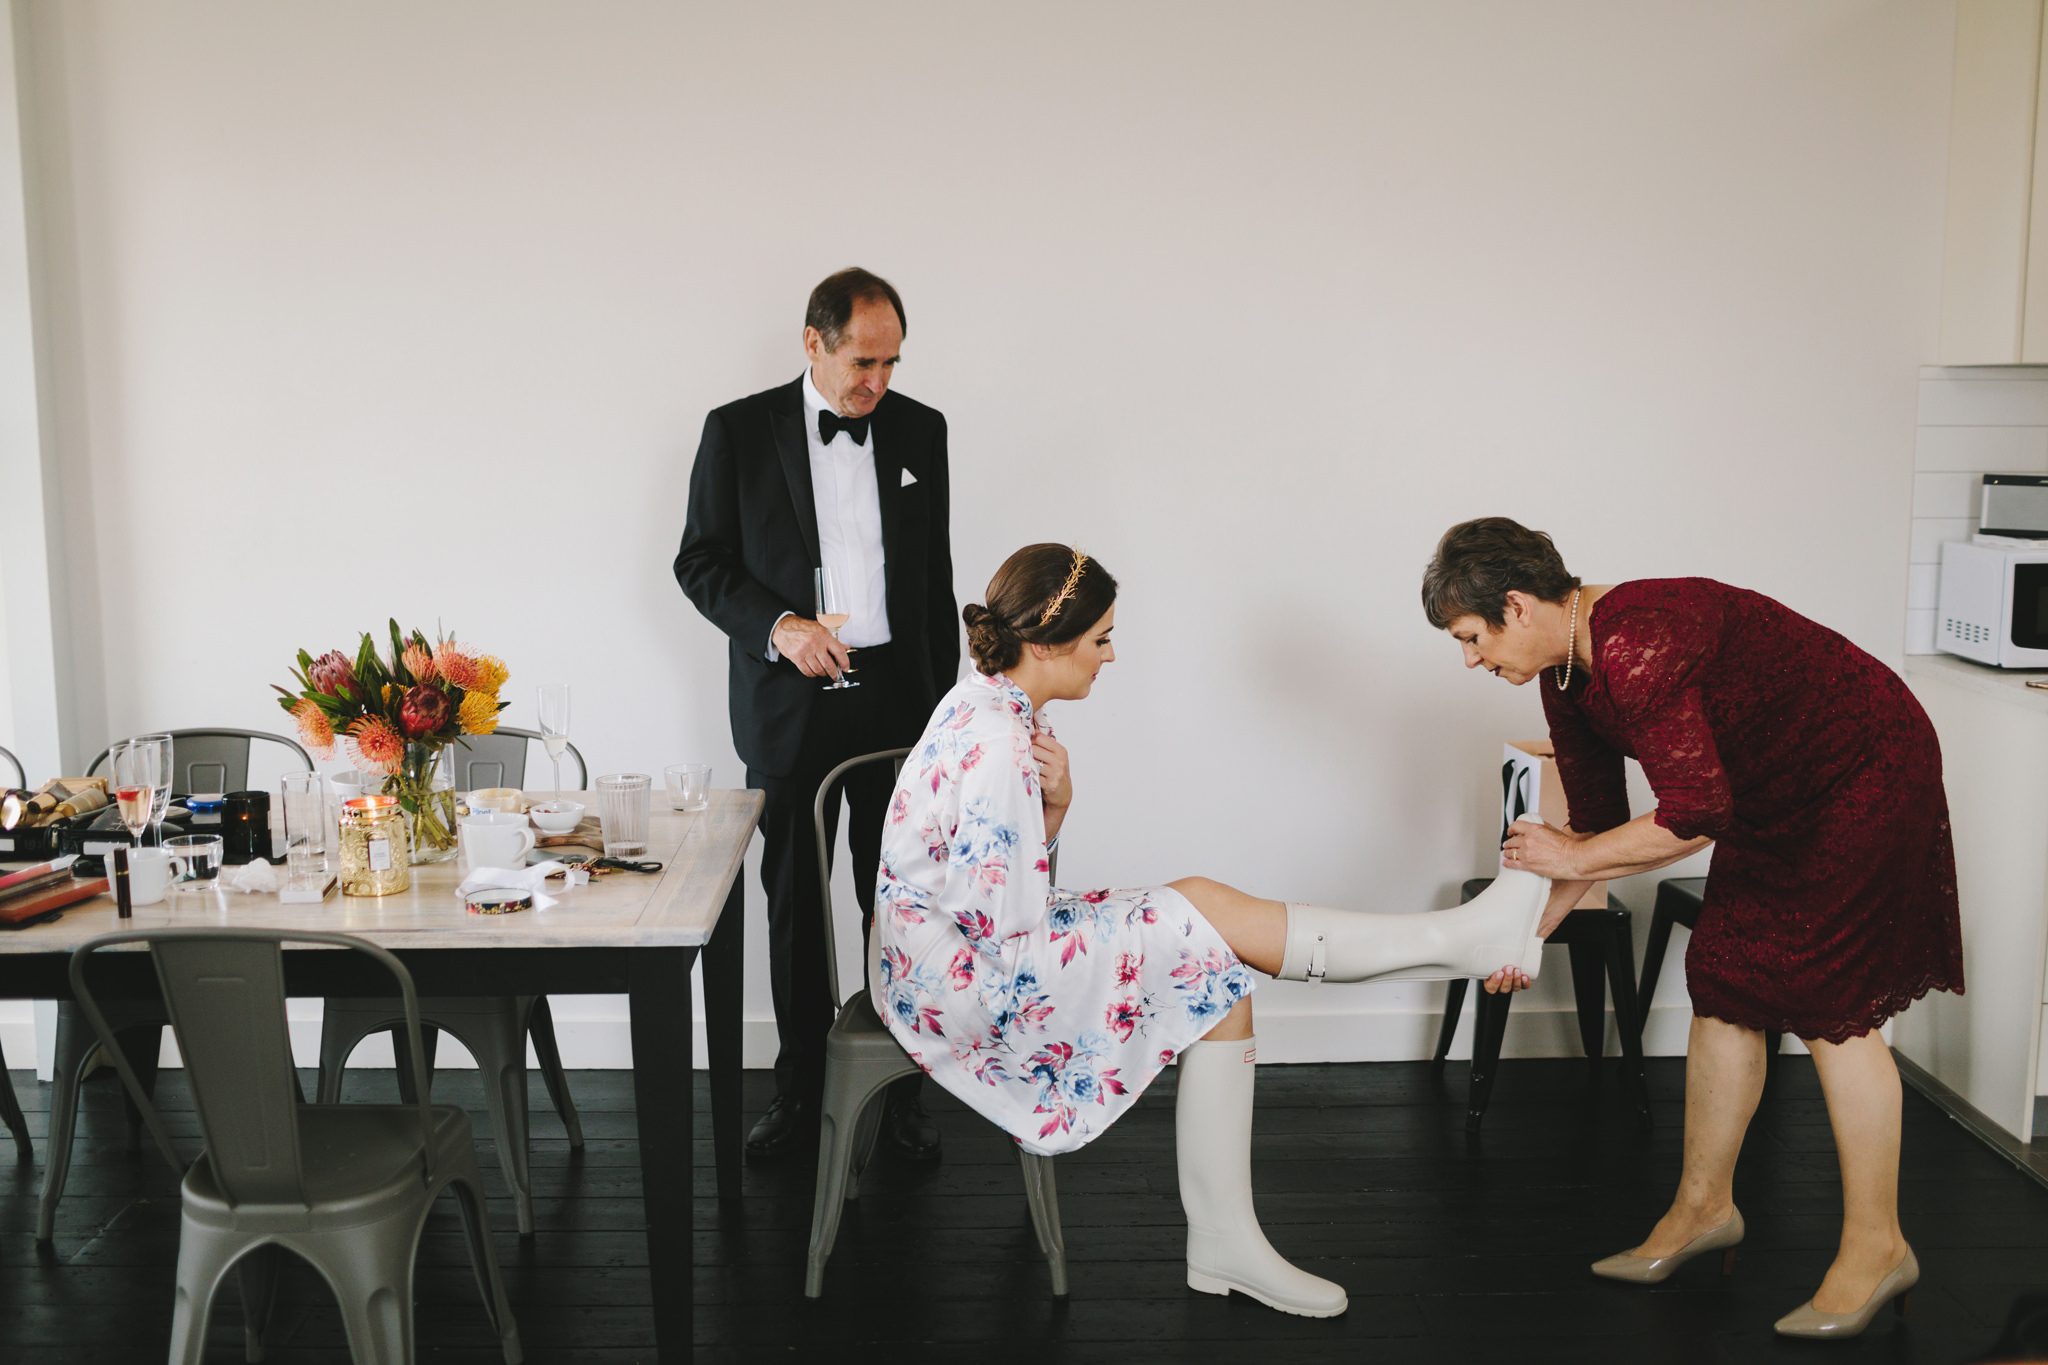 Abbotsford_Convent_Wedding_Peter_Anna023.JPG